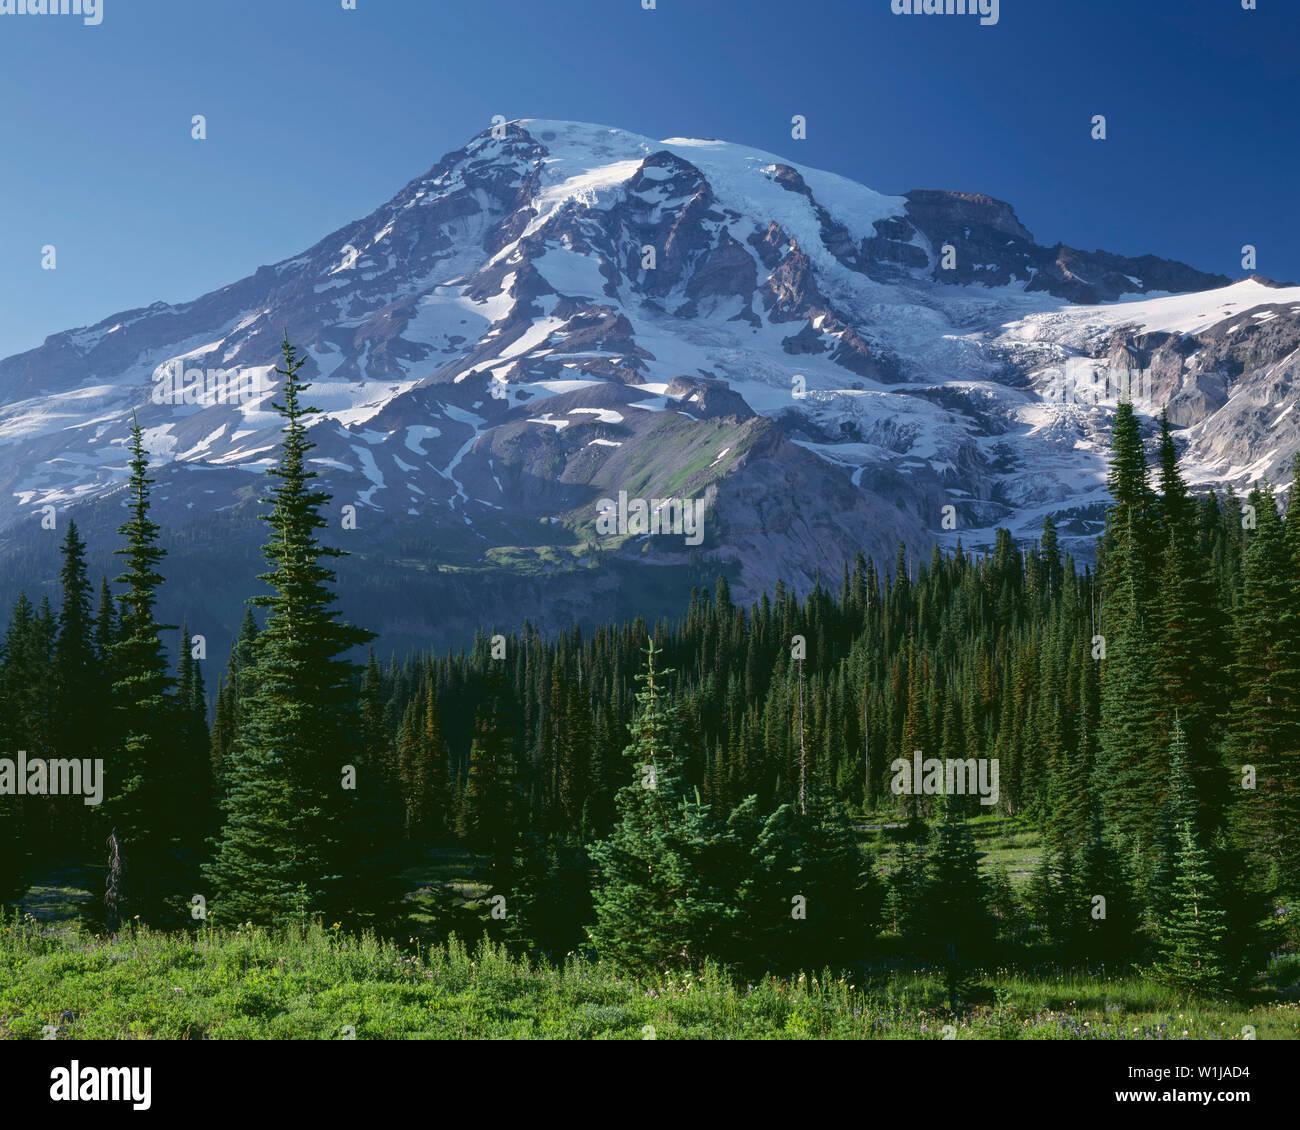 USA, Washington, Mt. Rainier National Park, Wildflower meadow and conifers below south side of Mt. Rainier. - Stock Image